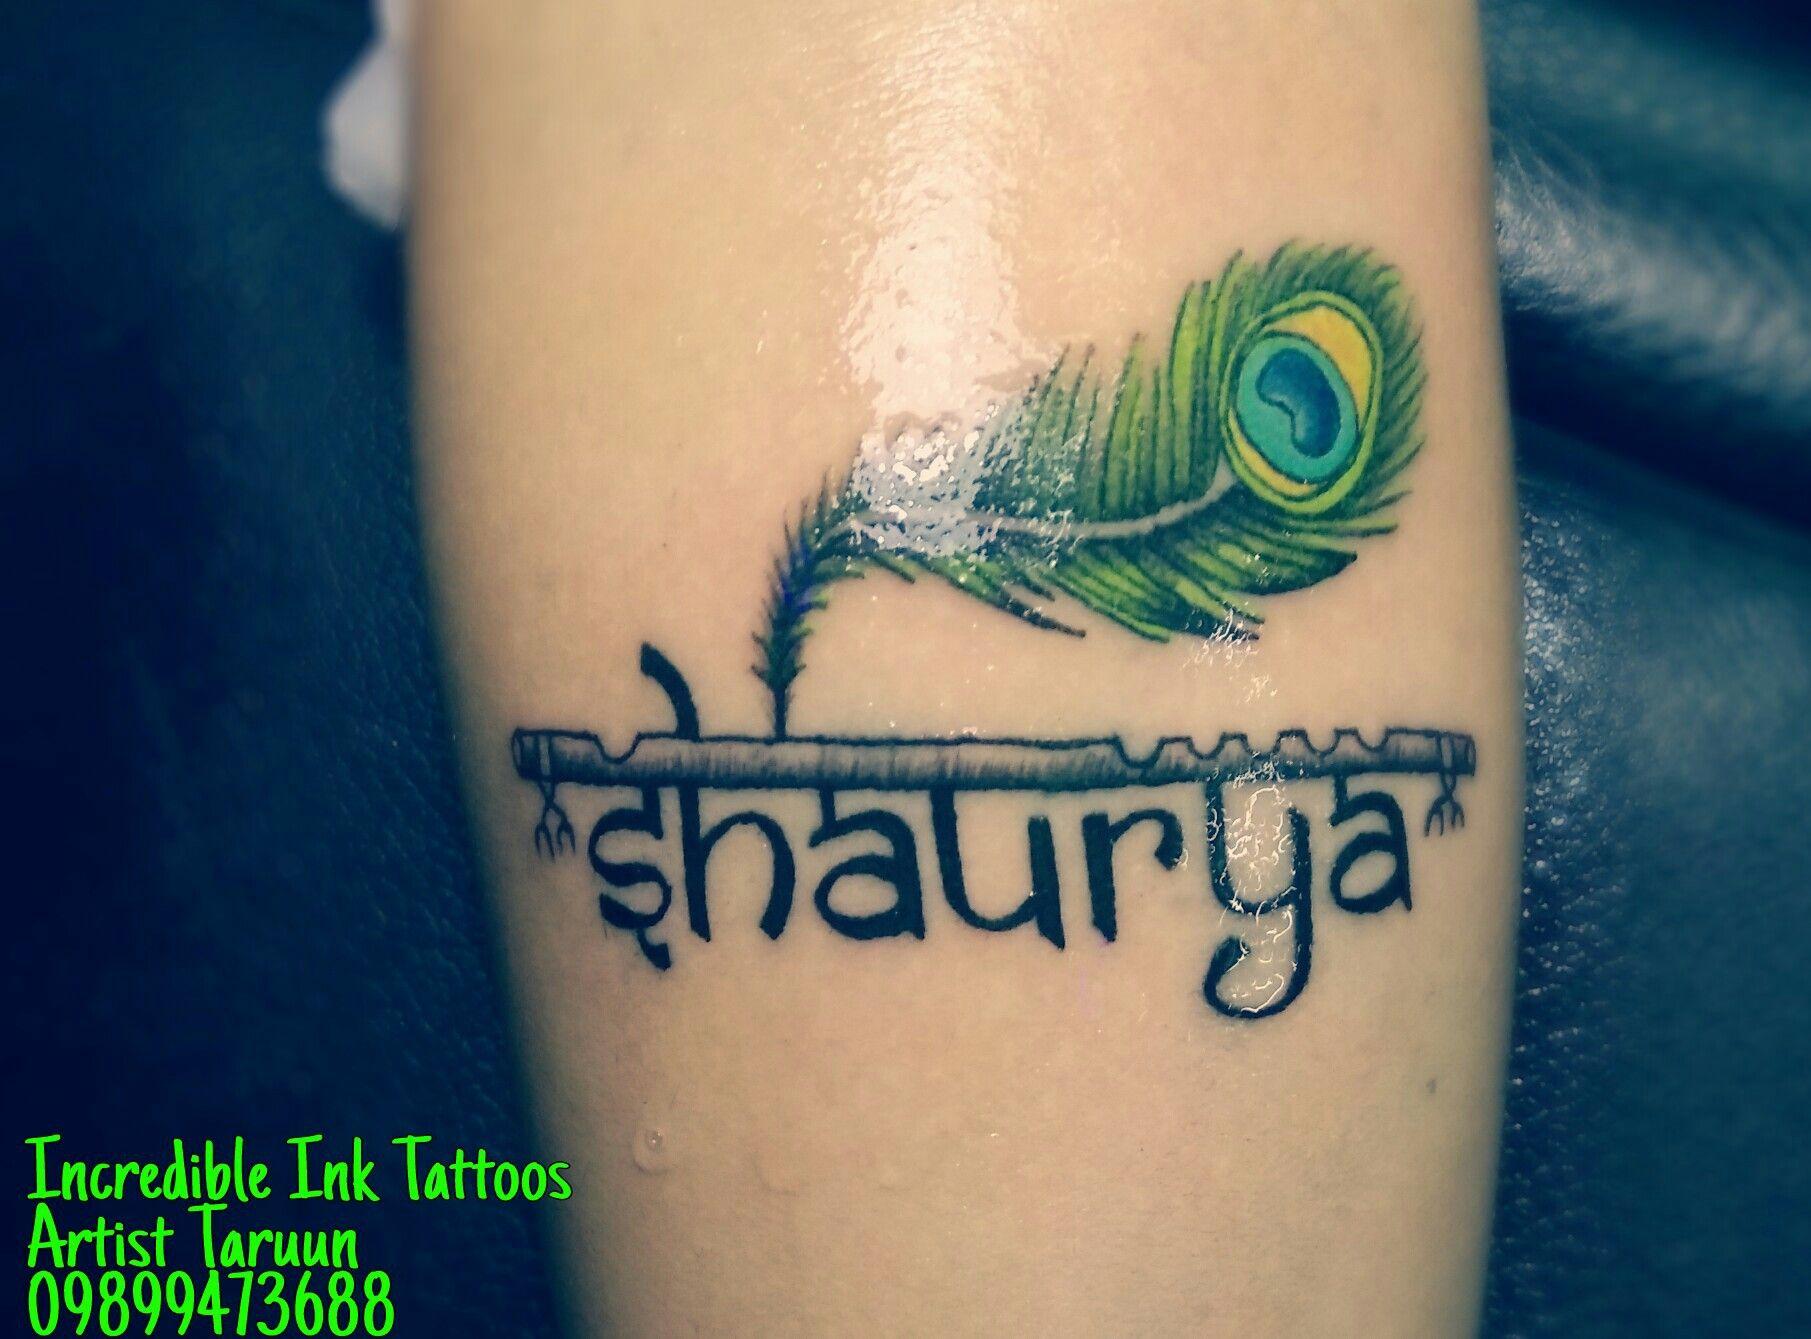 Name Tattoos: Incredible Ink Tattoos And Tattoo